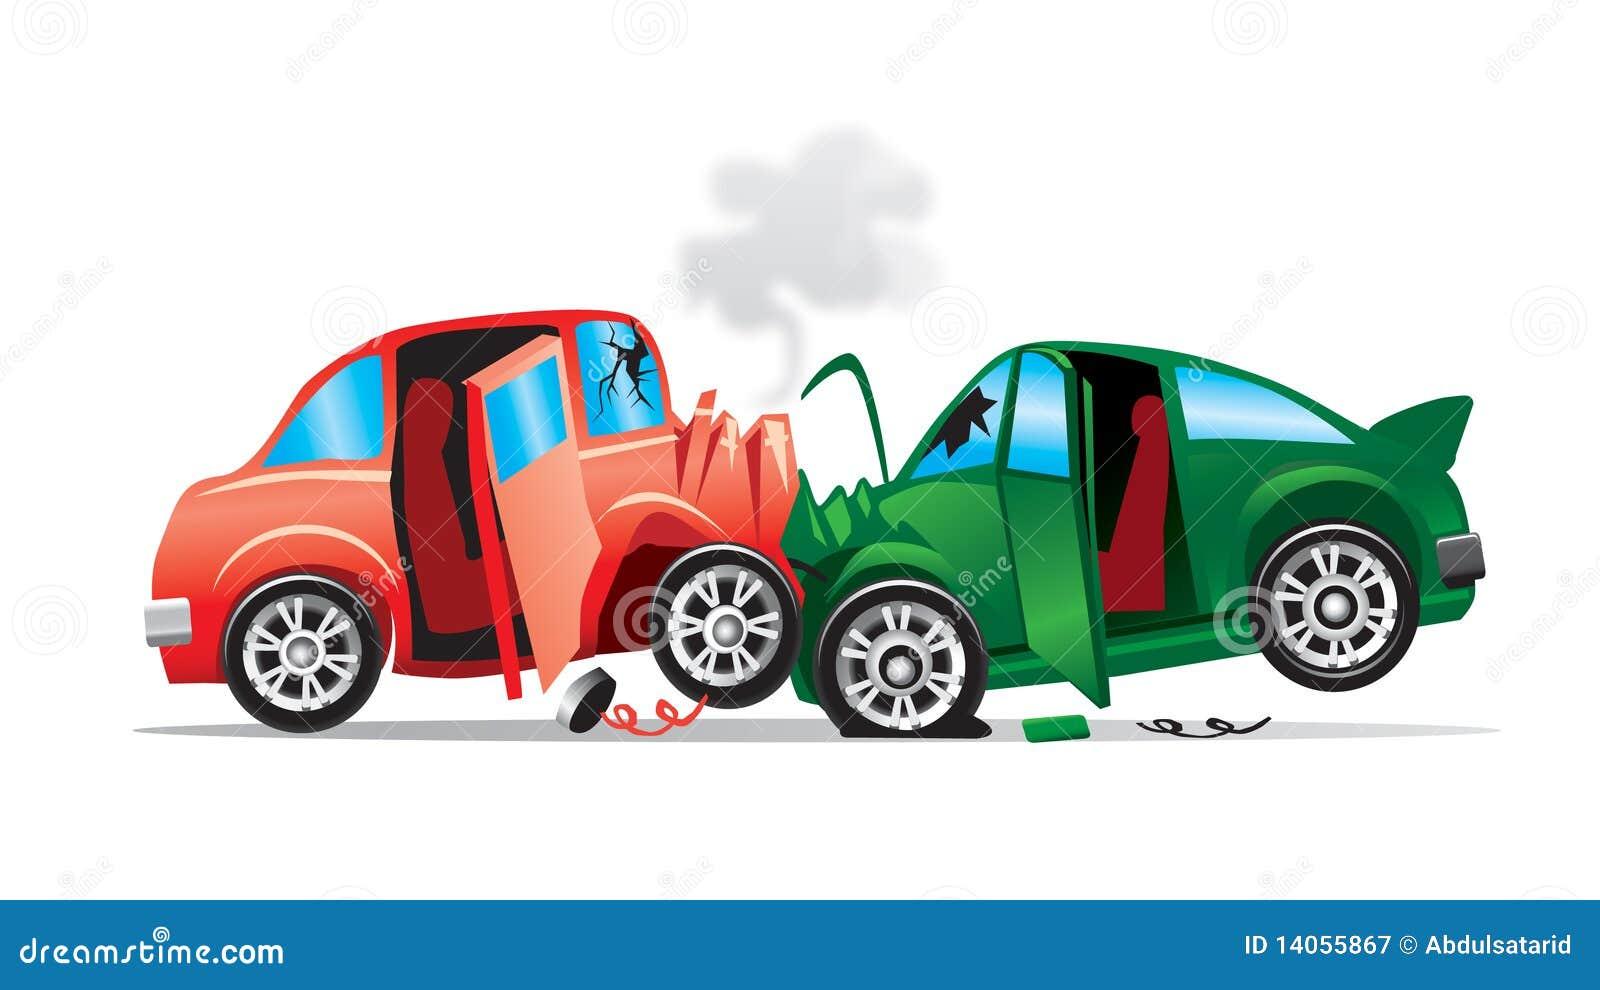 free clipart auto accident - photo #42